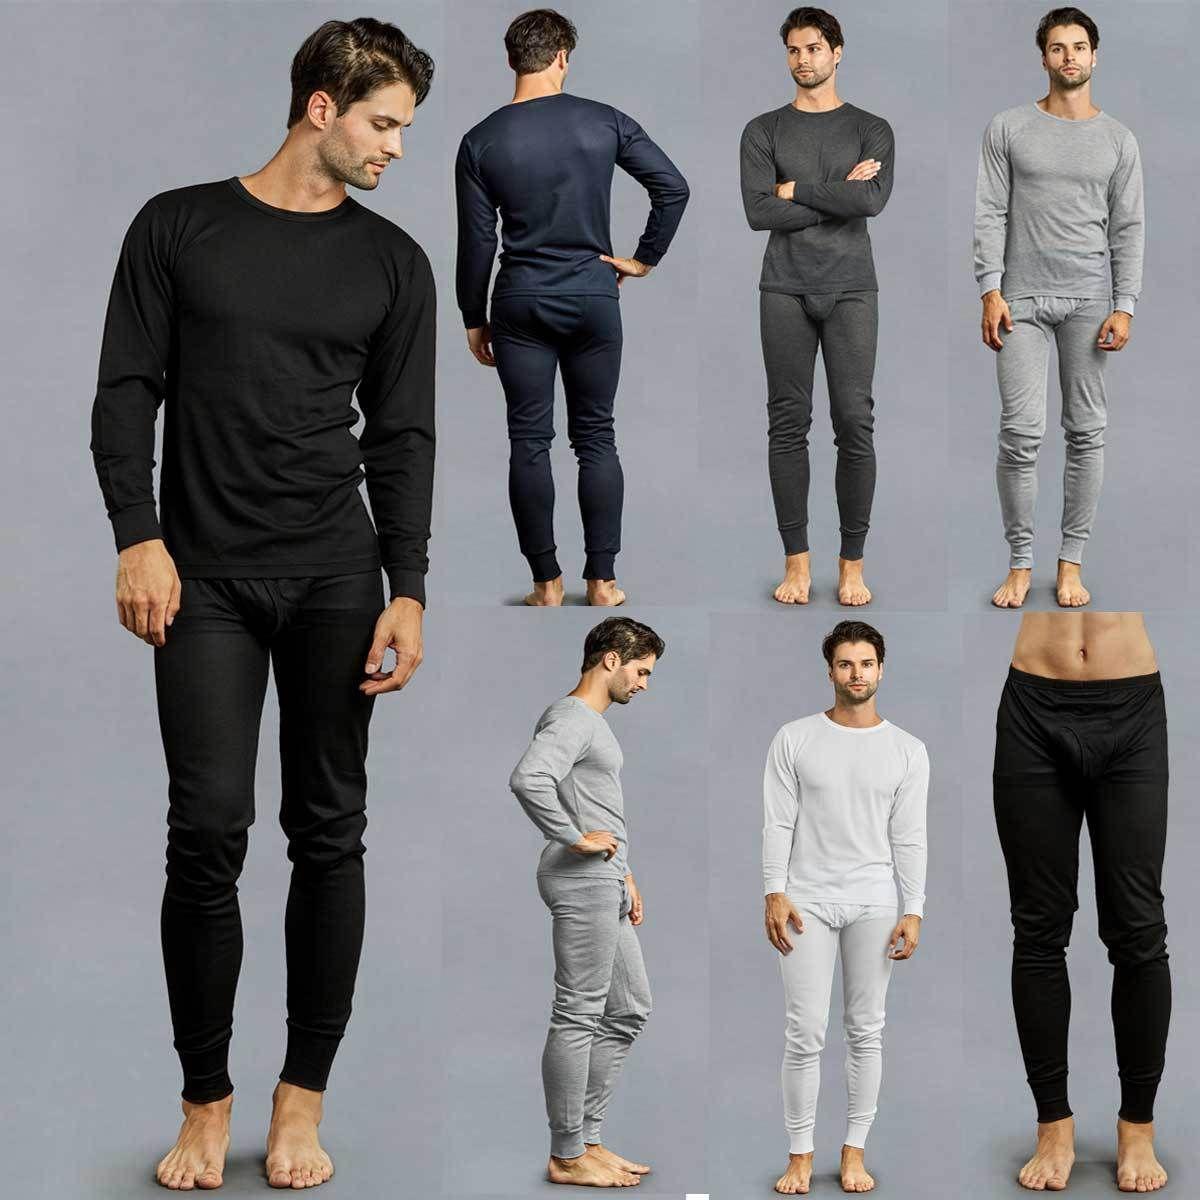 9b6fd4e41e6 Men s 2 pcs Thermal Underwear Set Long Sleeve Johns Waffle Knit Top Bottom  S~3XL